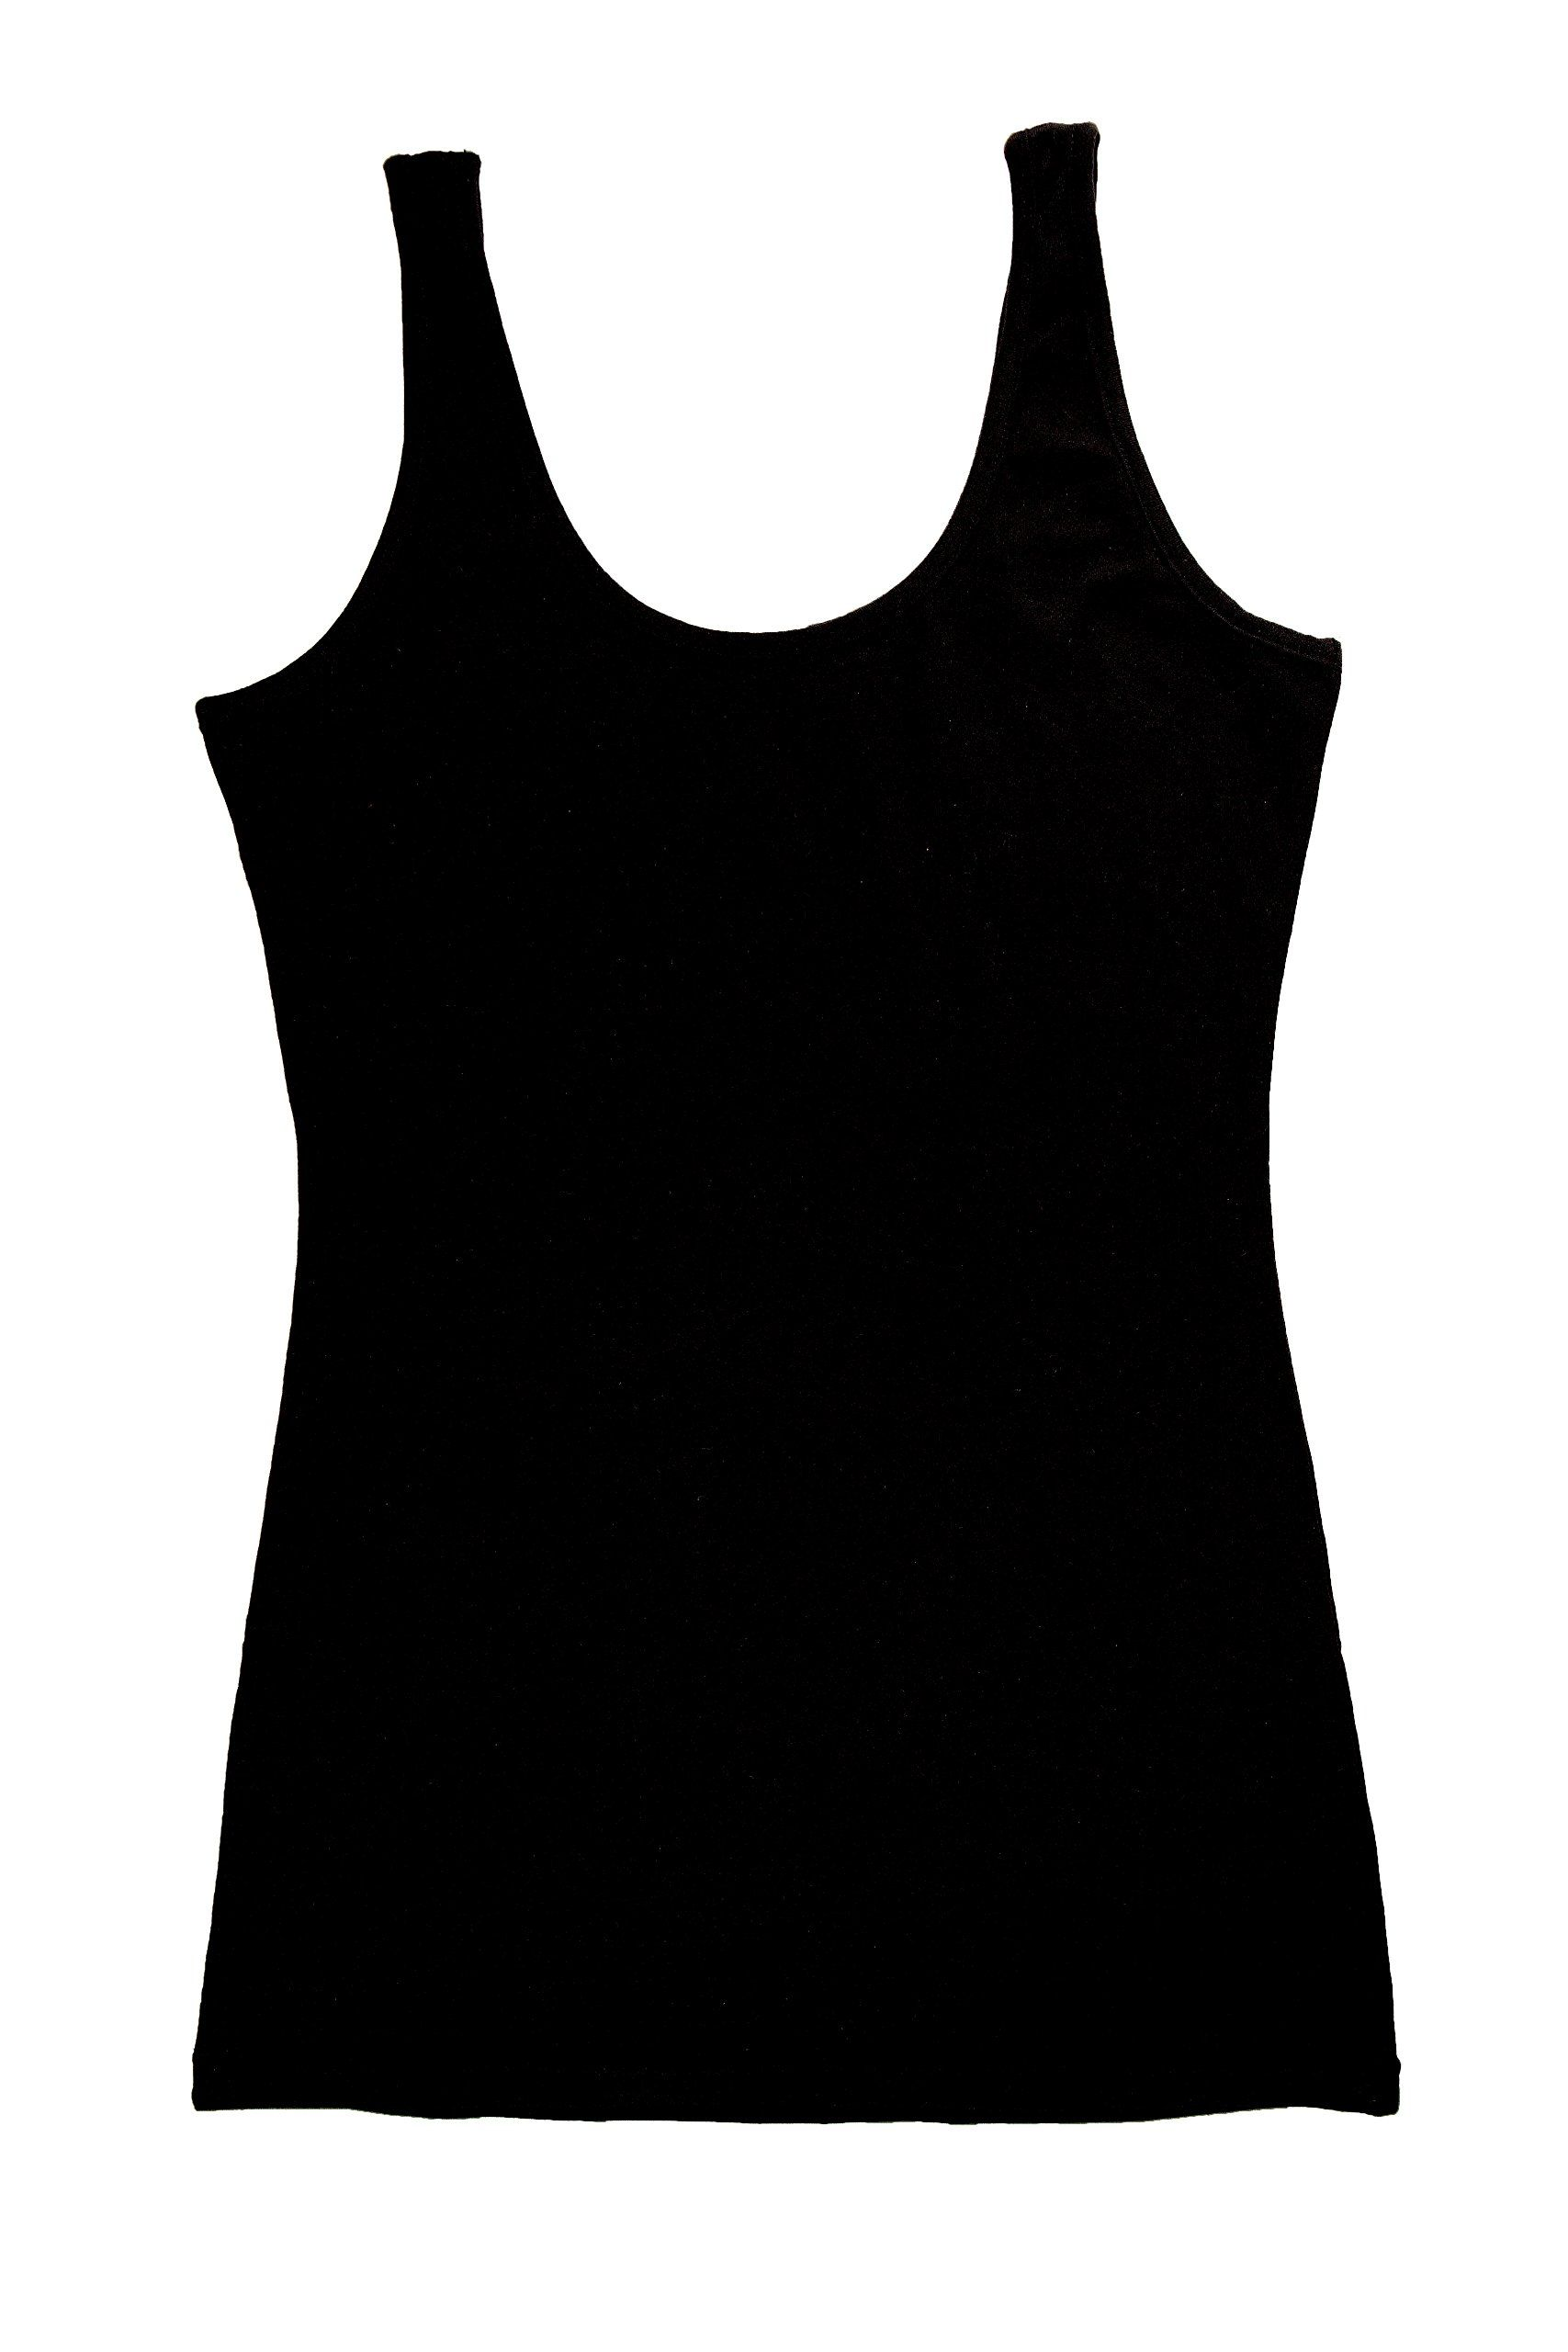 d57d60df18 TREELANCE Spiritual Yoga Tank Top Womens Yoga Tops Eco Friendly Cotton Yoga  Shirts. Organic Workout Yoga Tank Tops For Women. Plain Black XLarge      You can ...